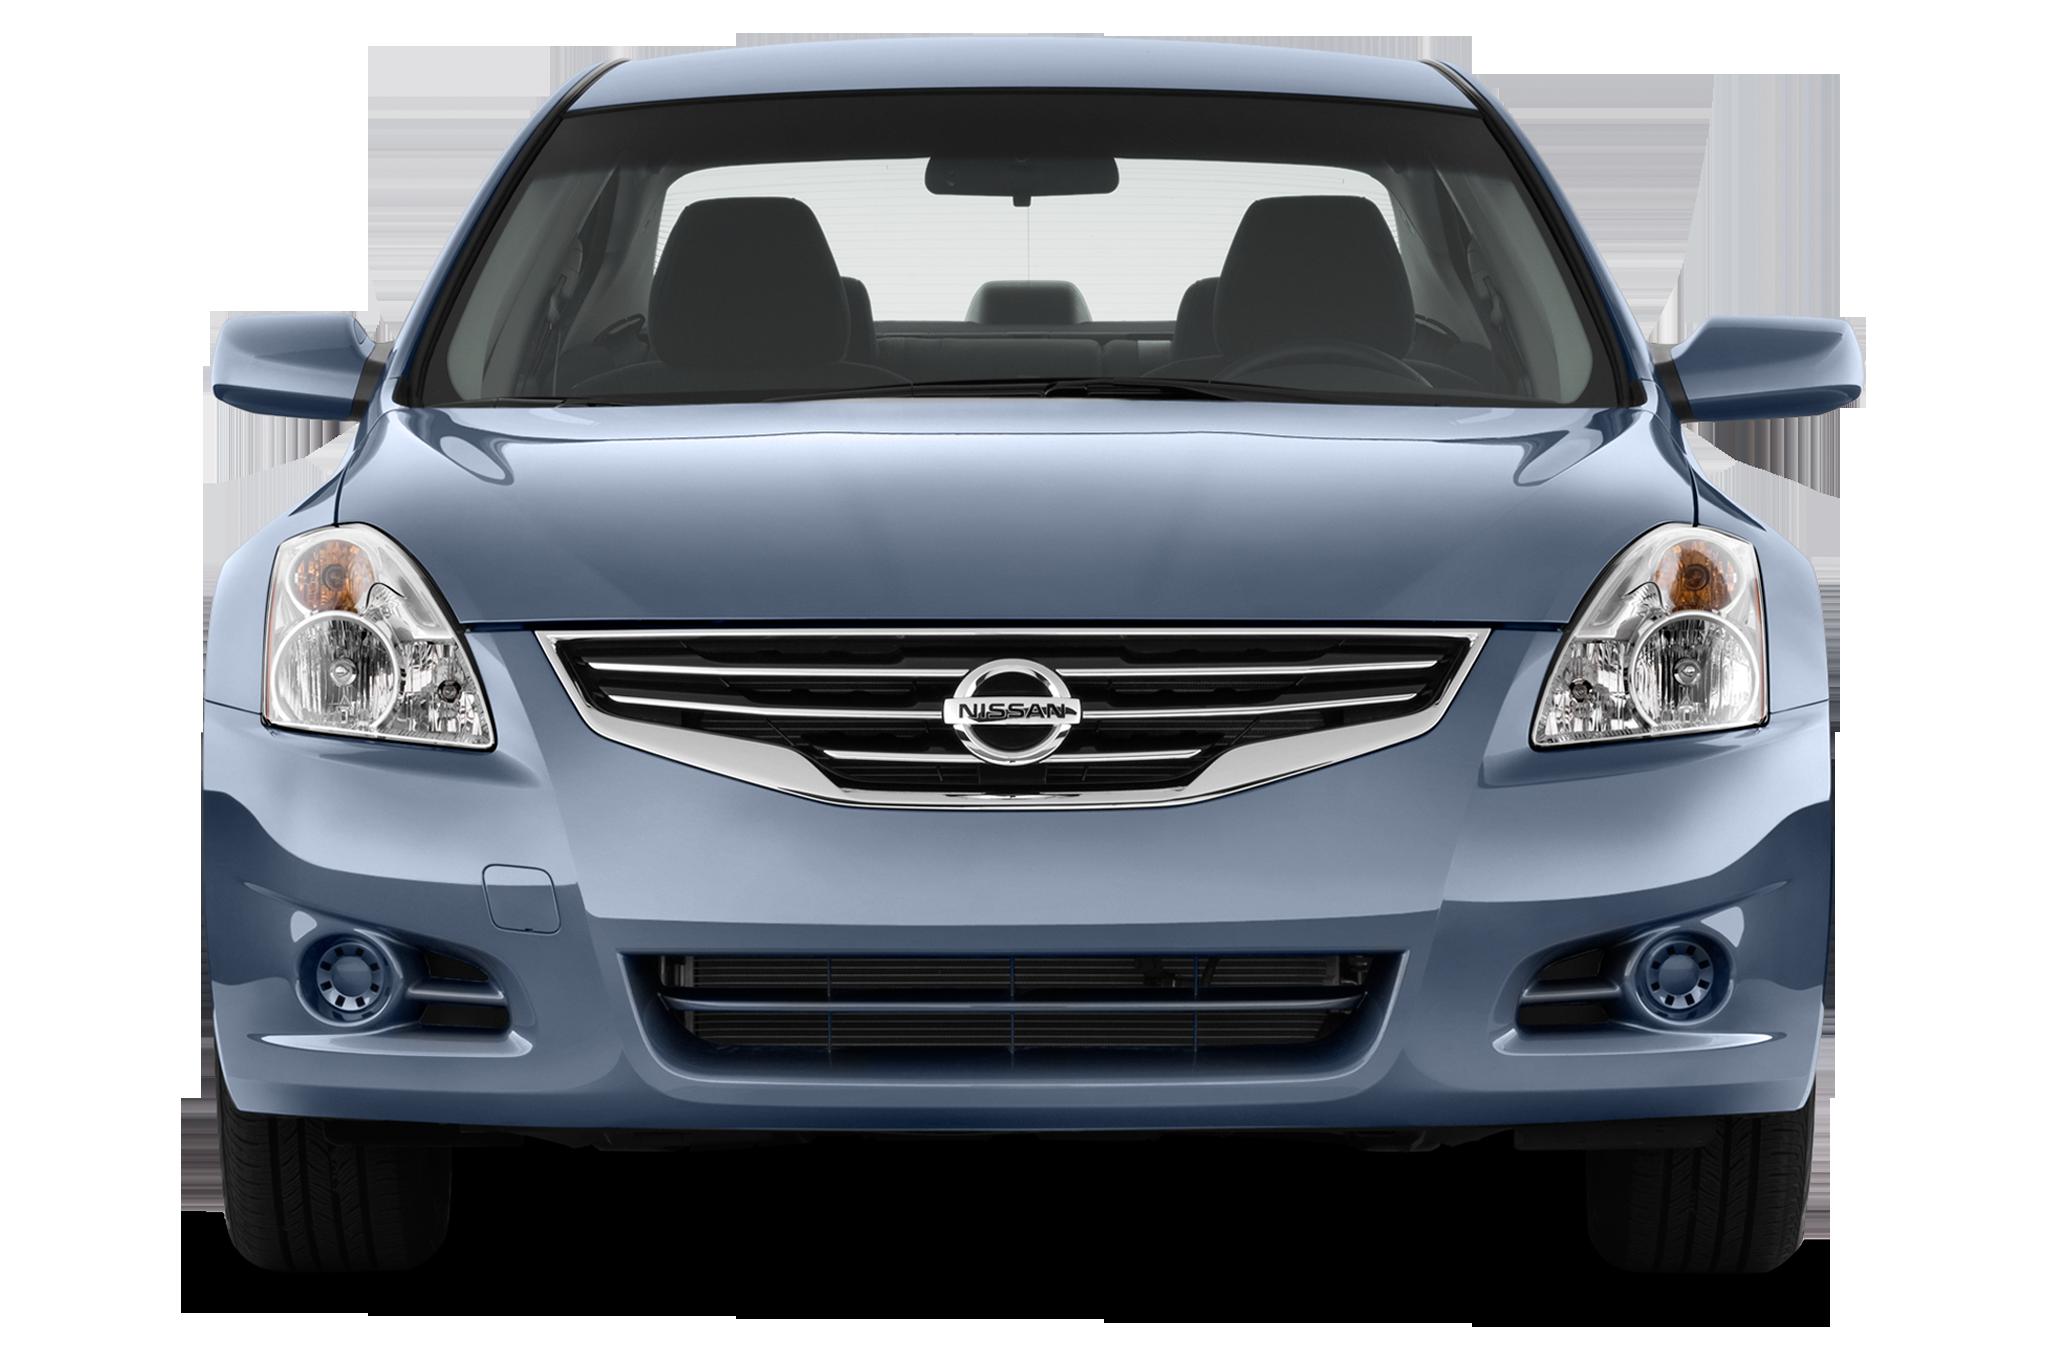 Nissan ALTIMA 2.5 S 6M/T   2012 ( PRICES U0026 SPECS )